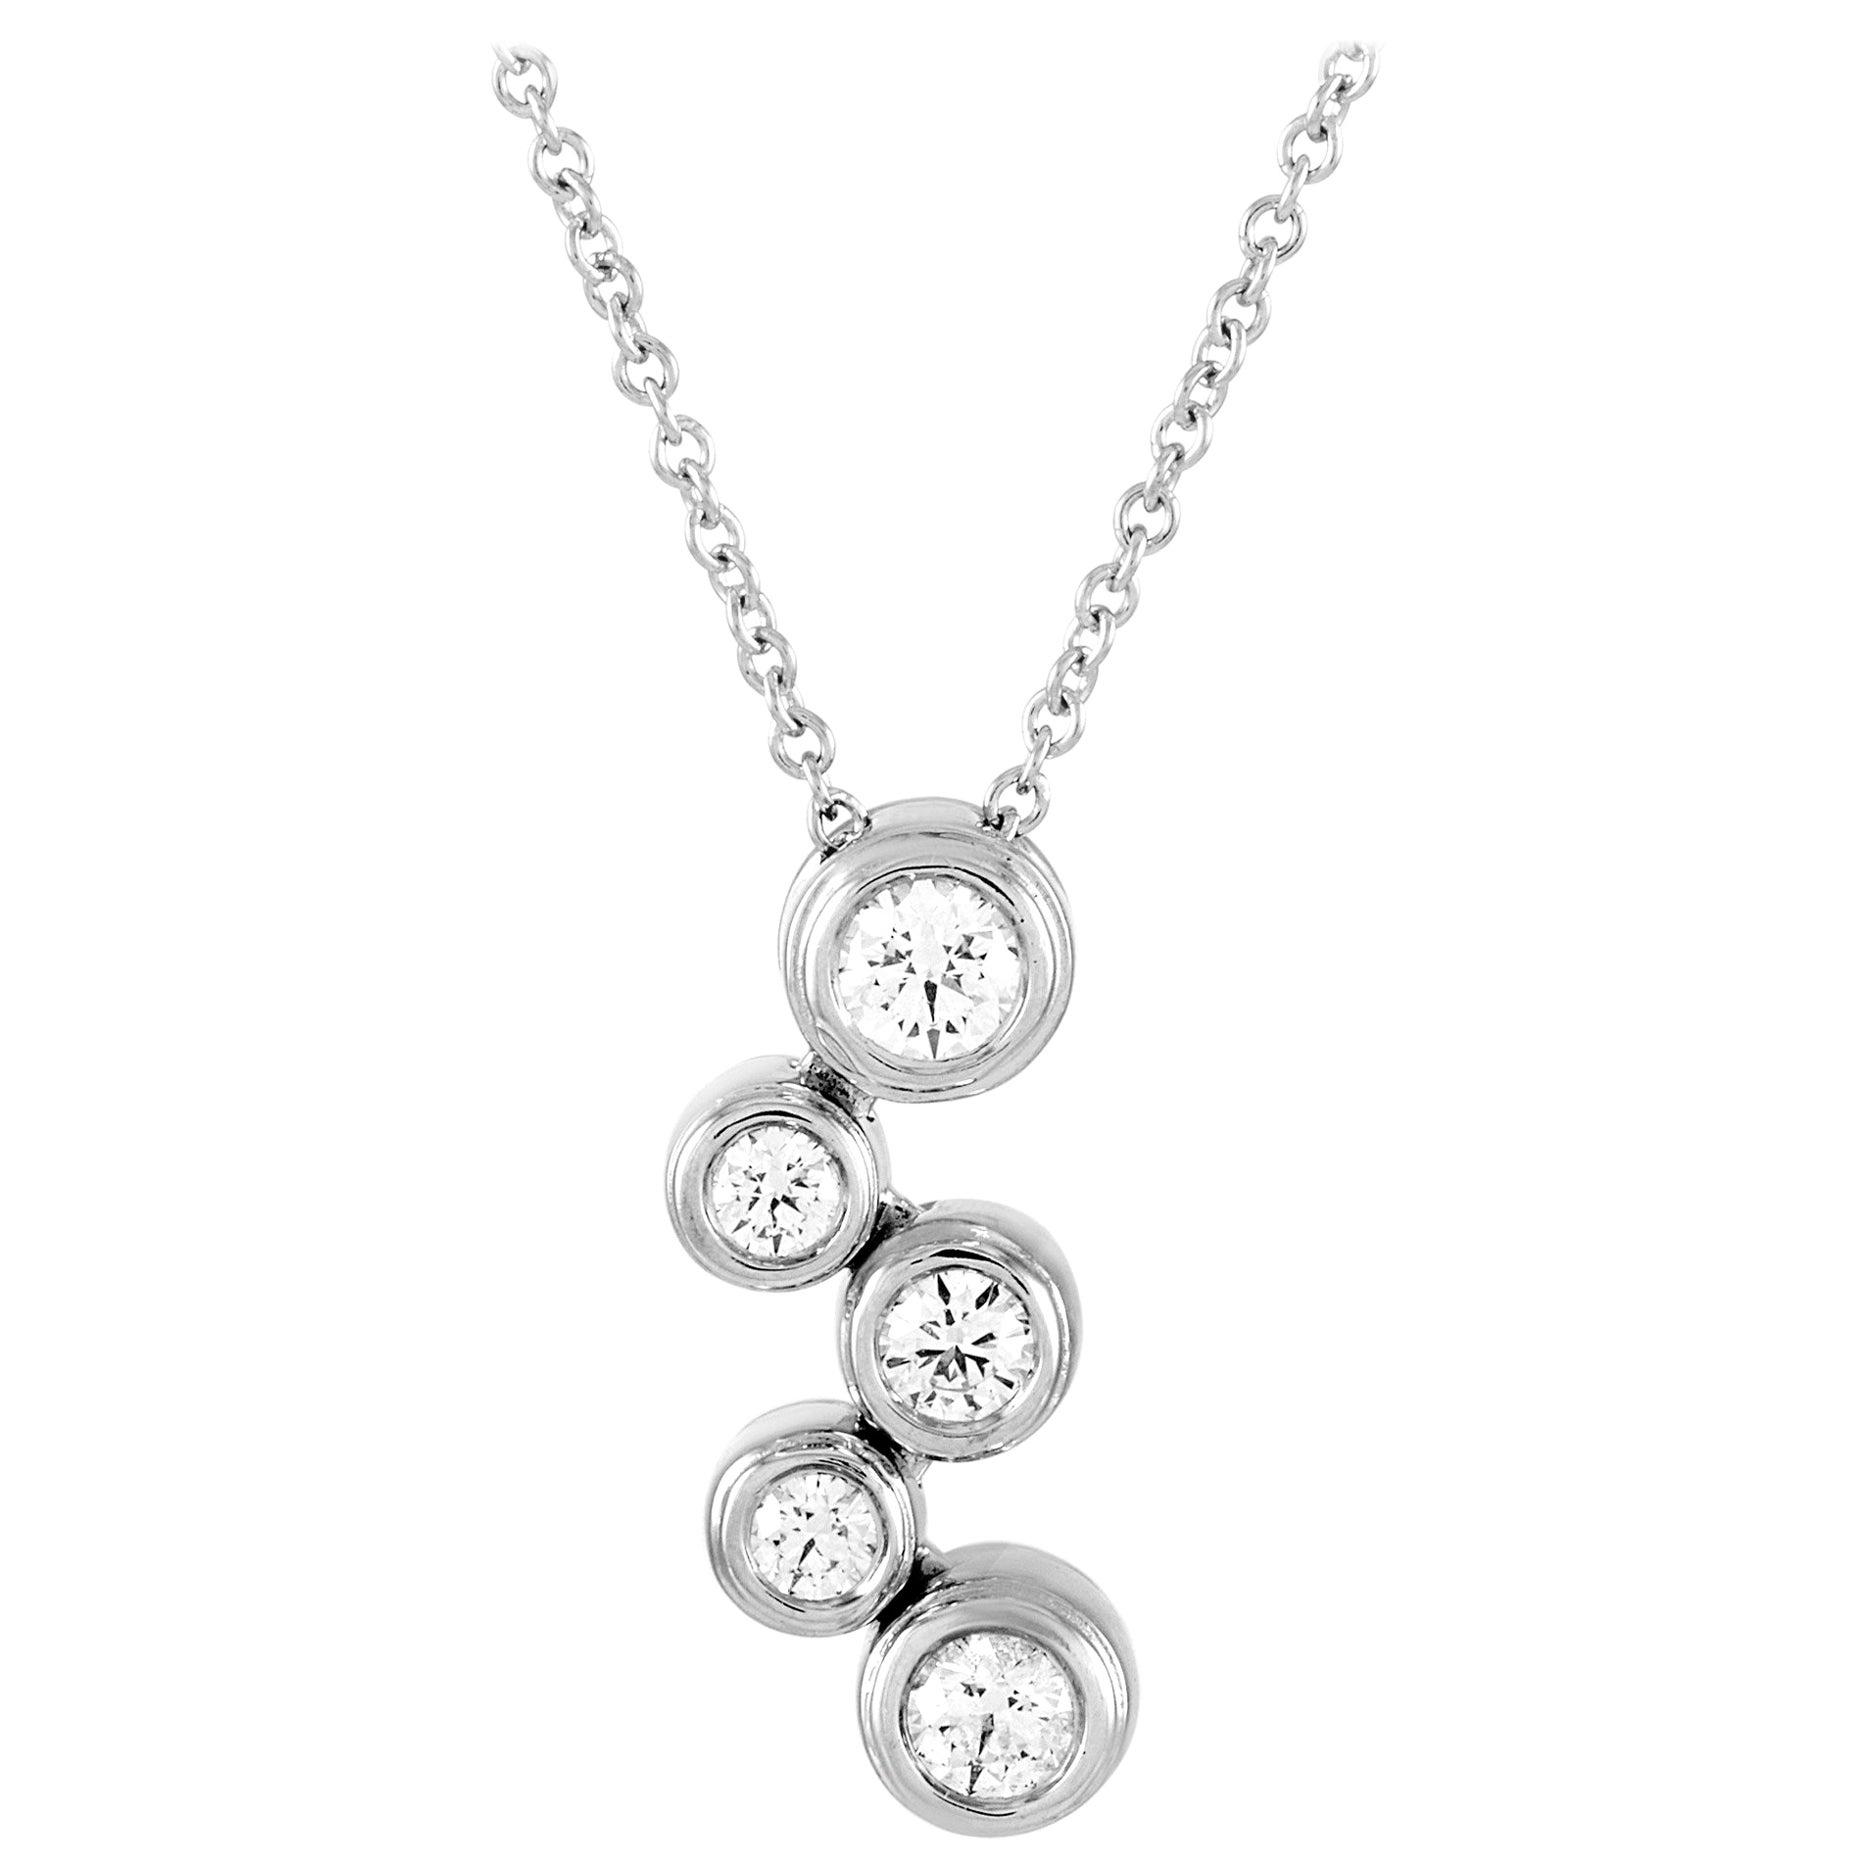 Tiffany & Co. Bubble Platinum 0.50 Carat Diamond Pendant Necklace